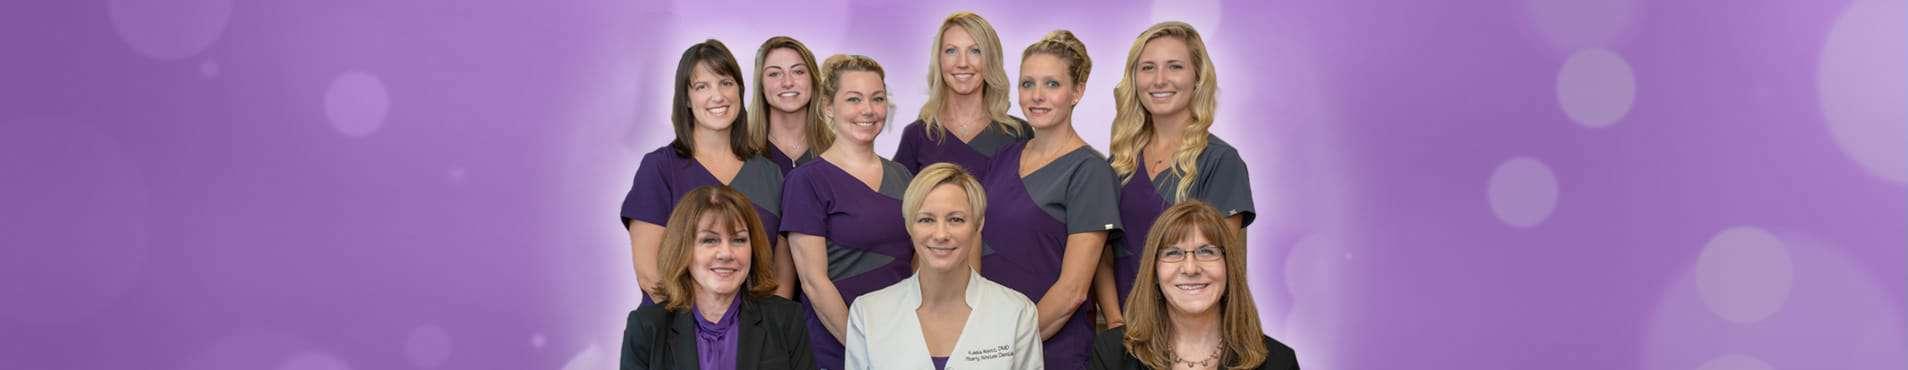 Dental Crowns Dentist Serving Trevose